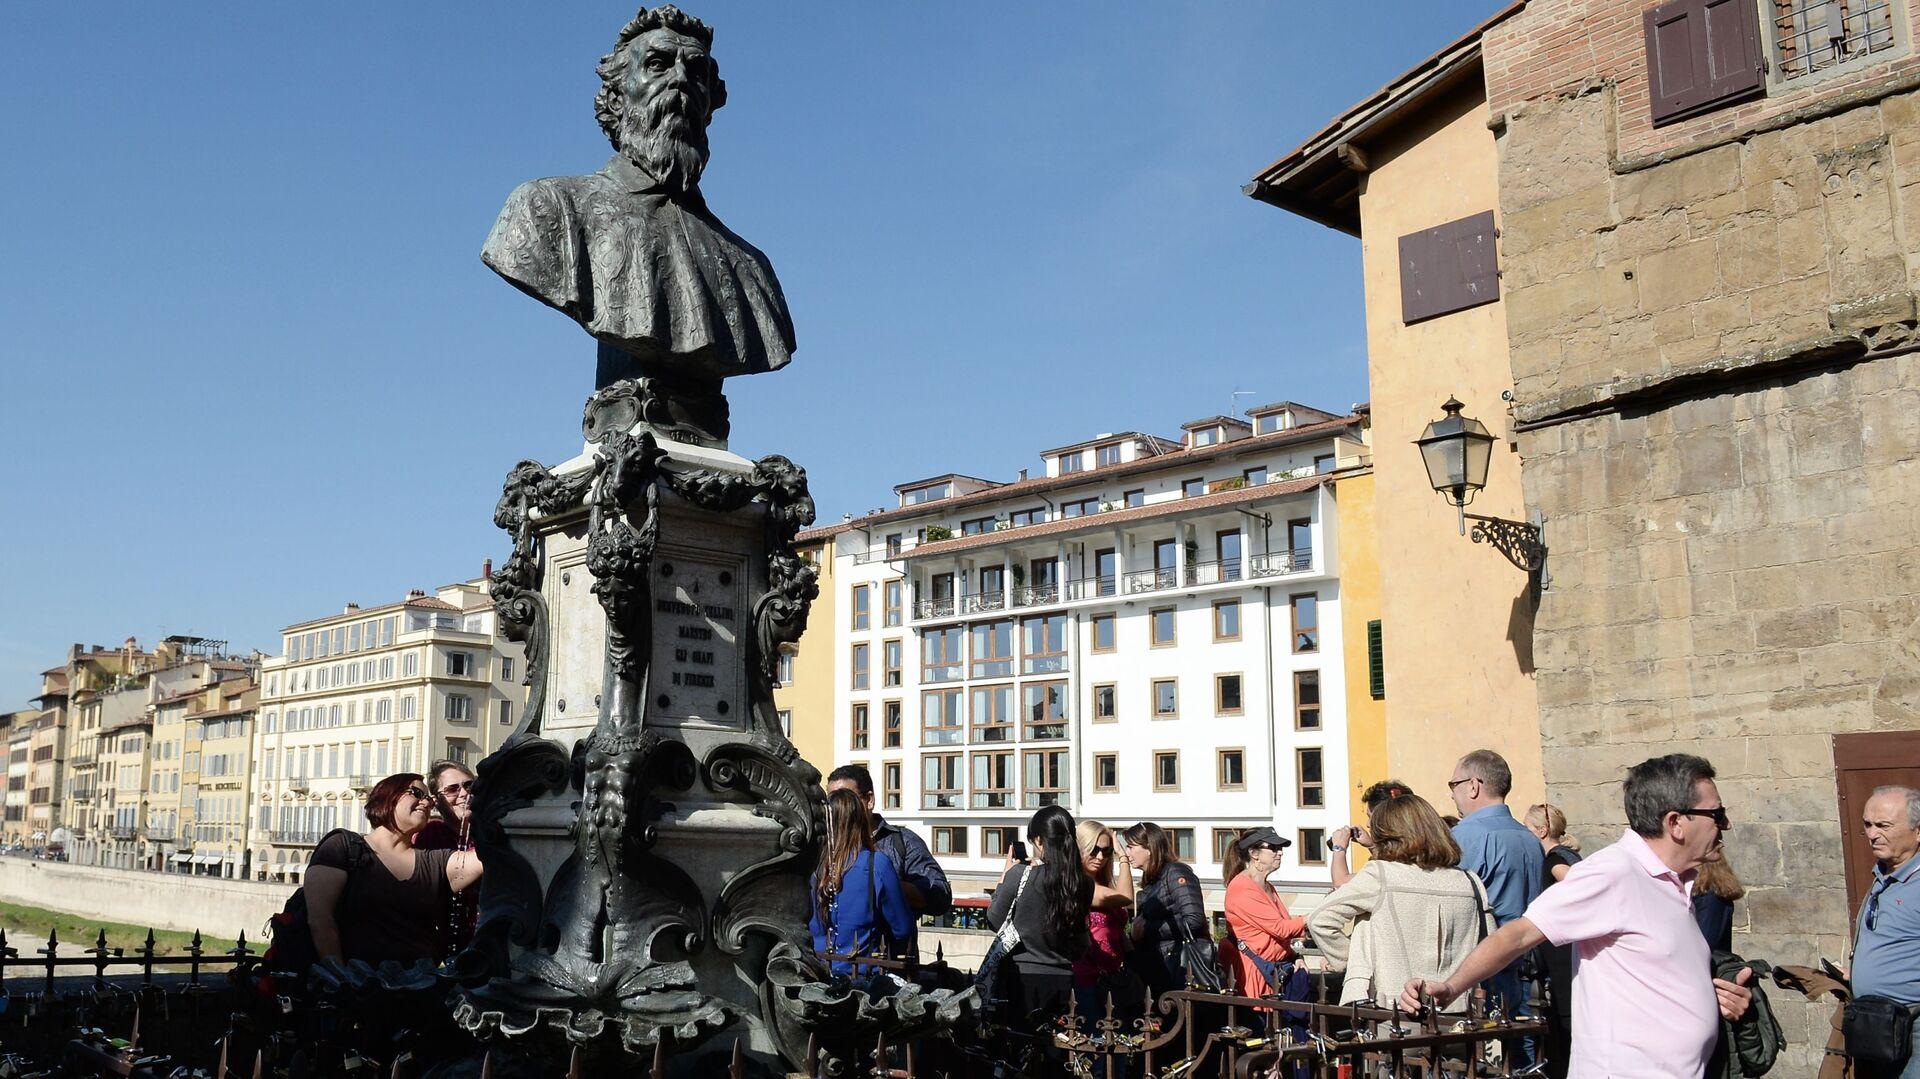 Turisti a Firenze - Sputnik Italia, 1920, 12.06.2021